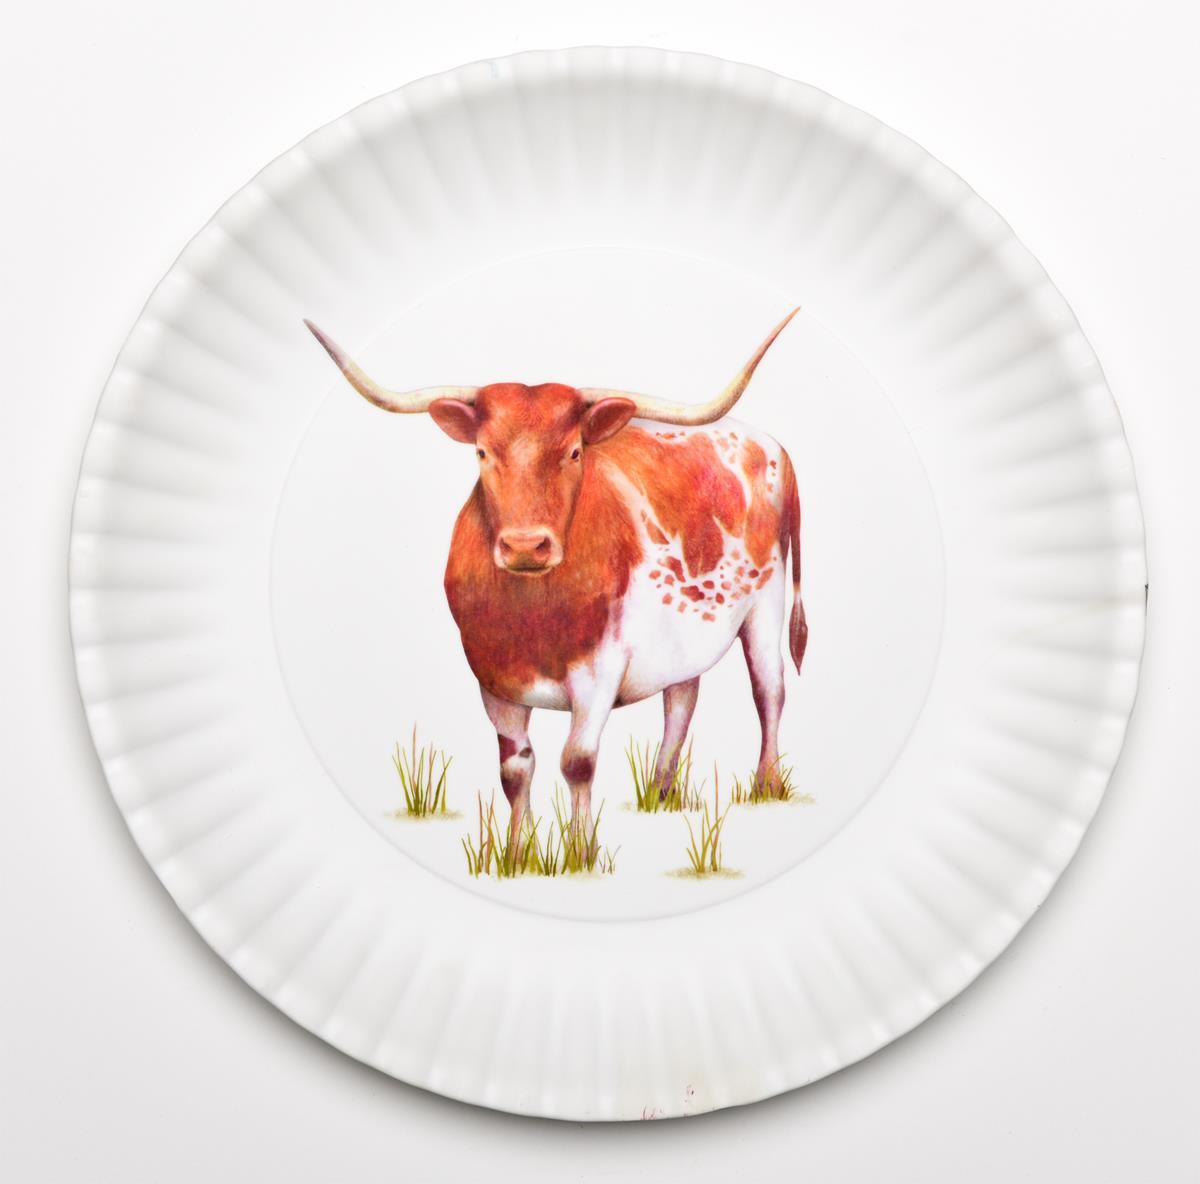 Ceramic dip dish, round relish dish, appetizer serving dish